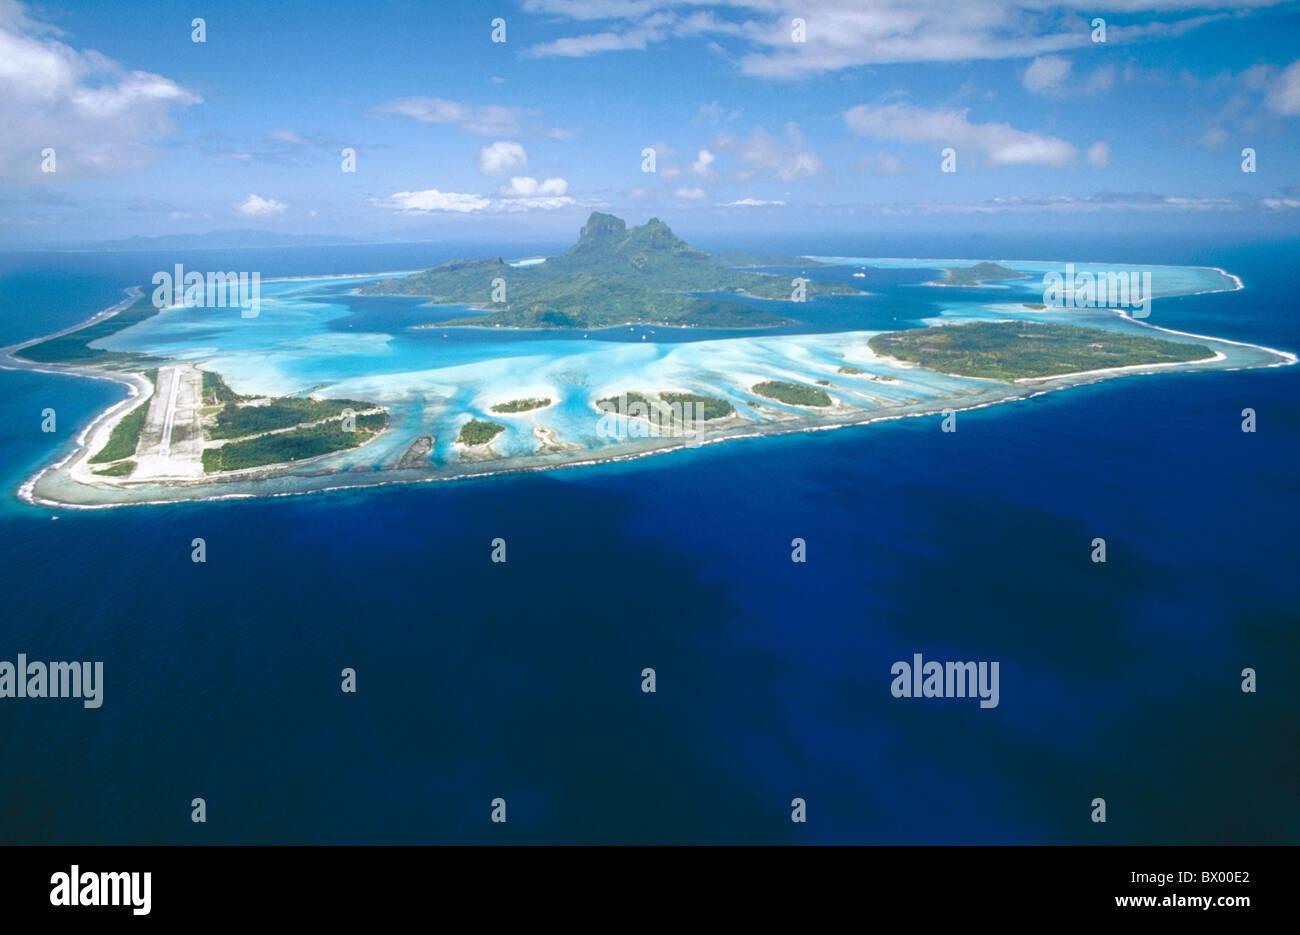 Bora Bora Insel Insel Meer pazifischen Atoll Flug Hang totale Links Luftbild Luftaufnahme Stockbild